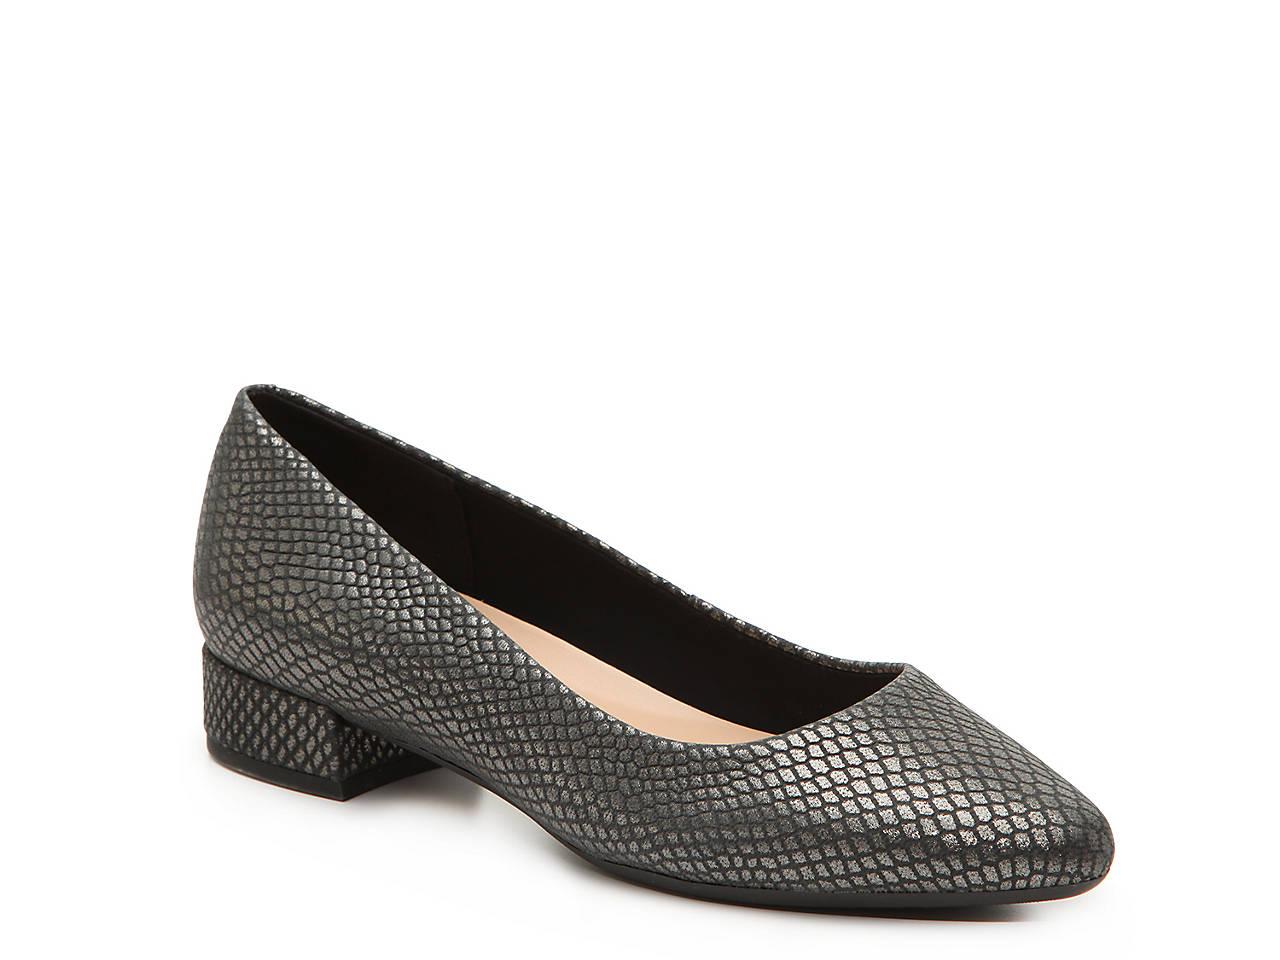 db522c21c9e Easy Spirit Caldise 2 Pump Women s Shoes